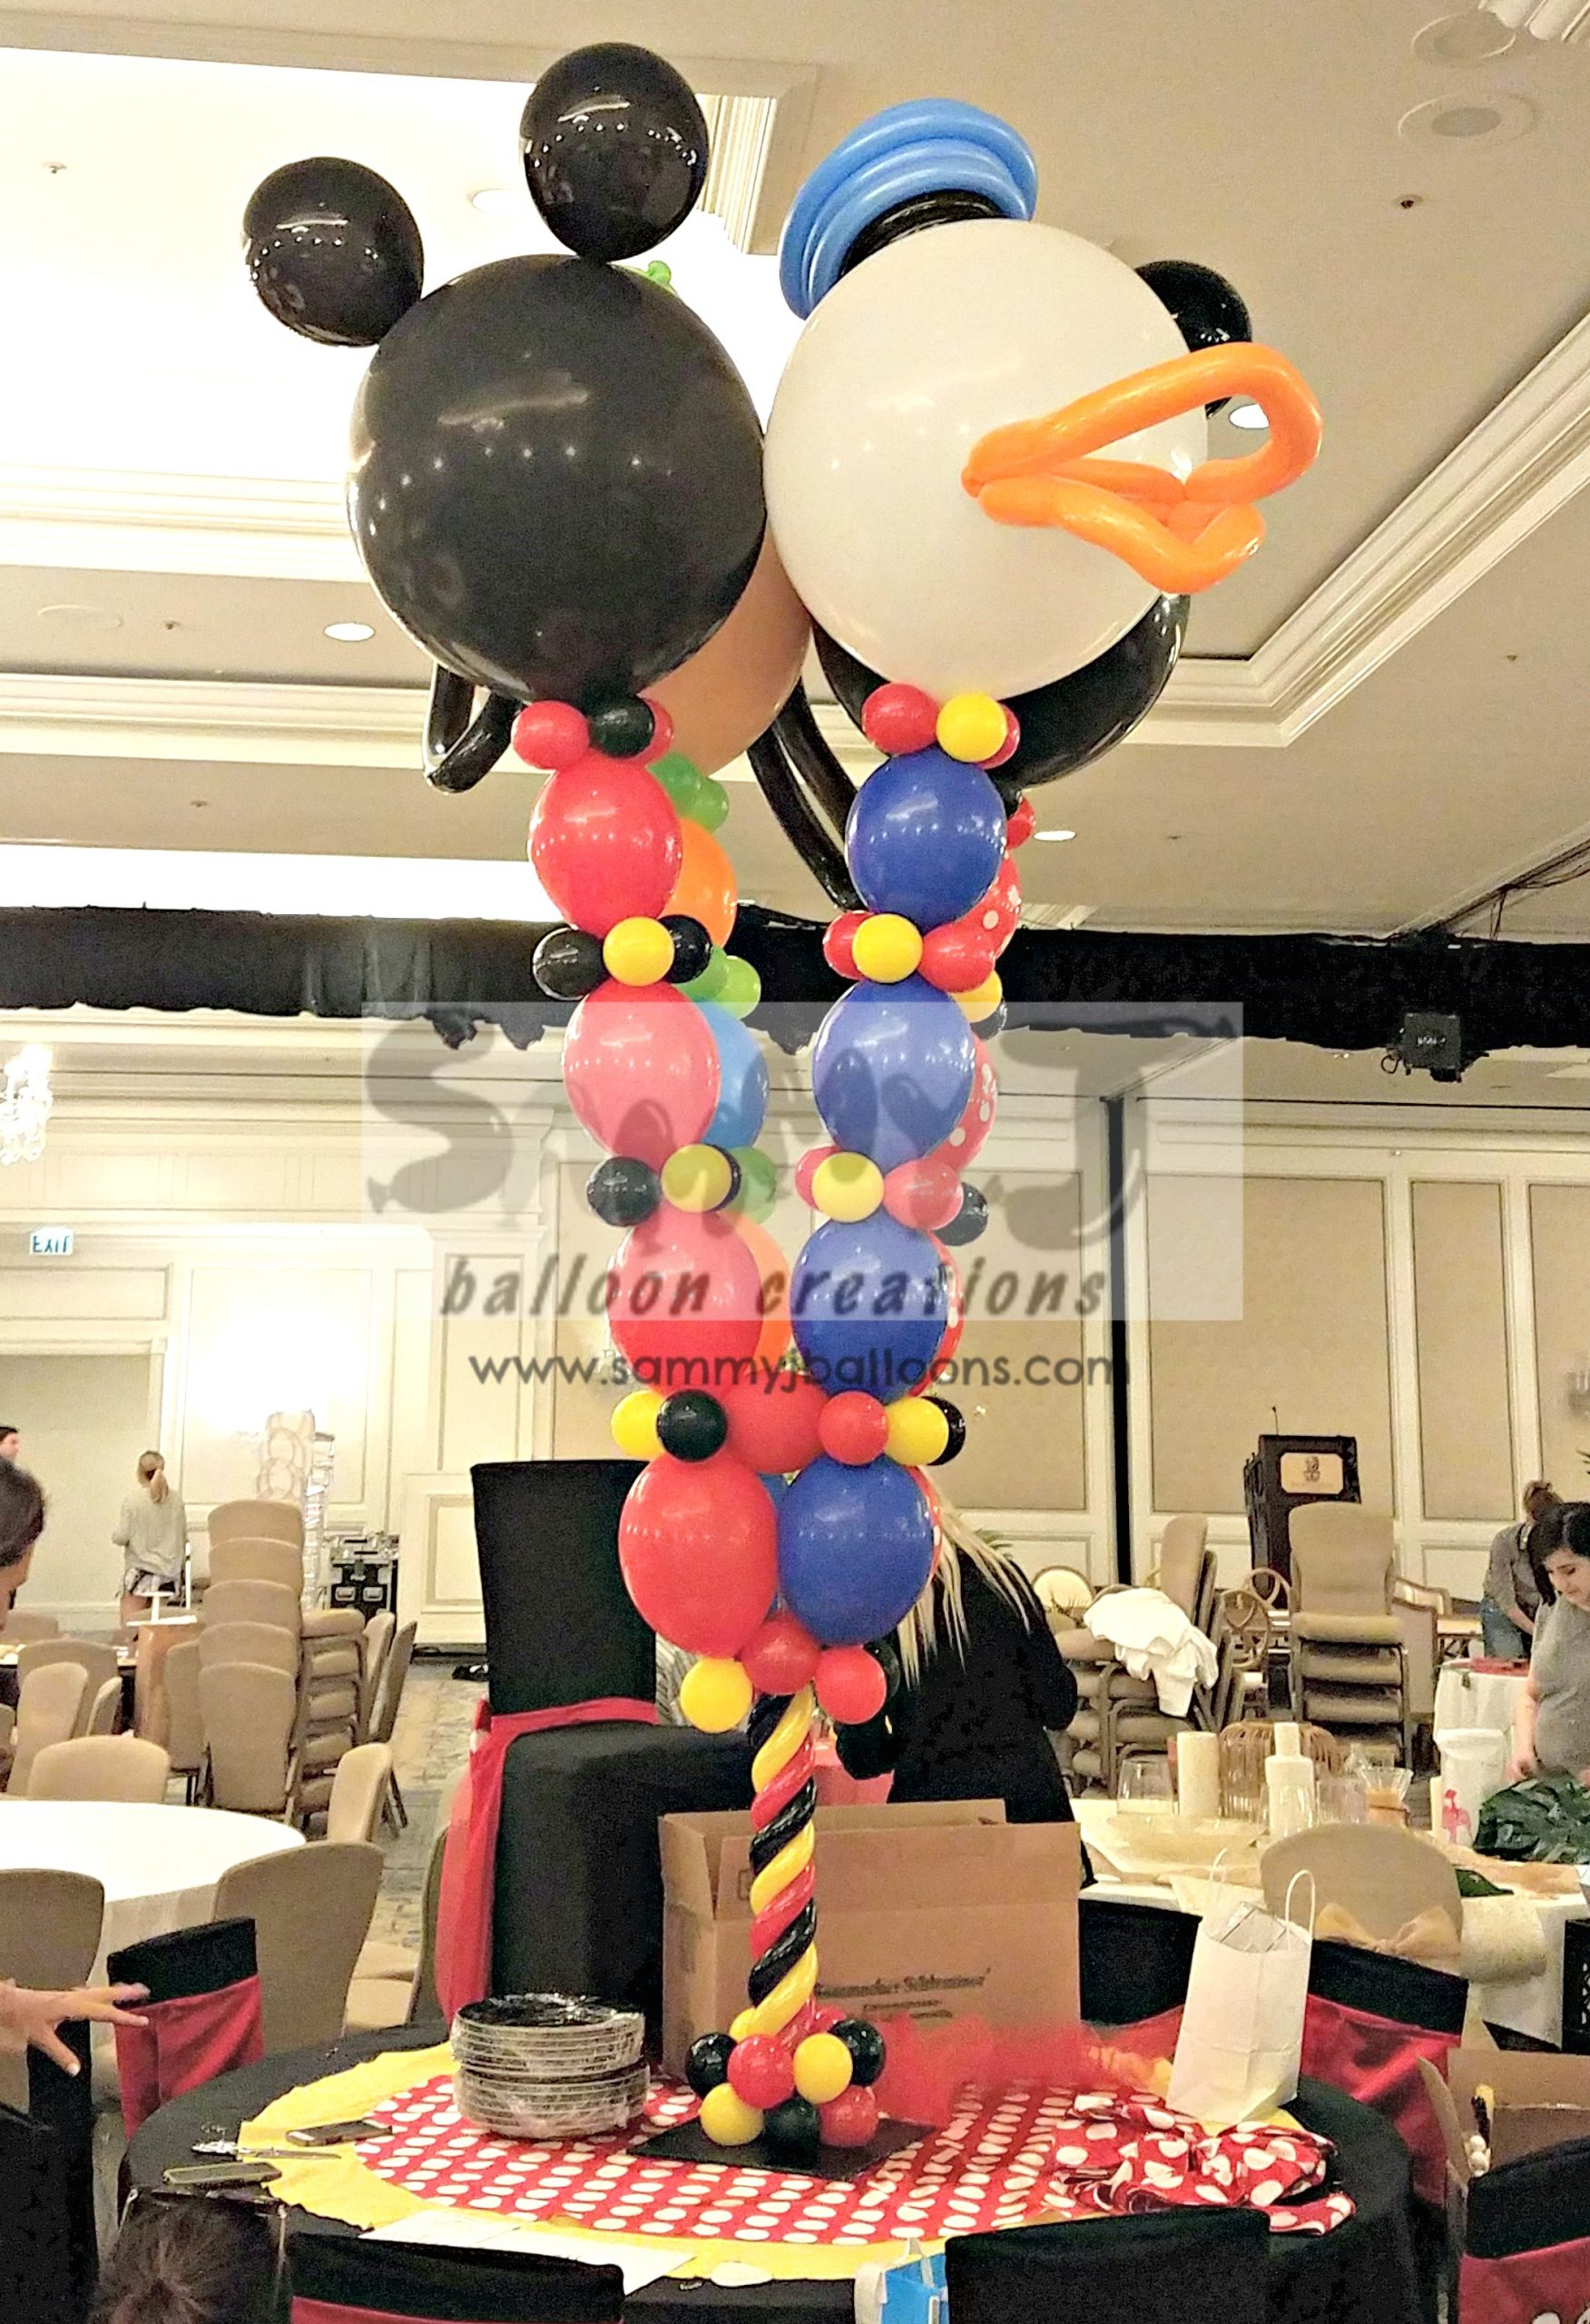 SAMMY J Balloon Creations st louis balloons disney mickey minnie centerpiece